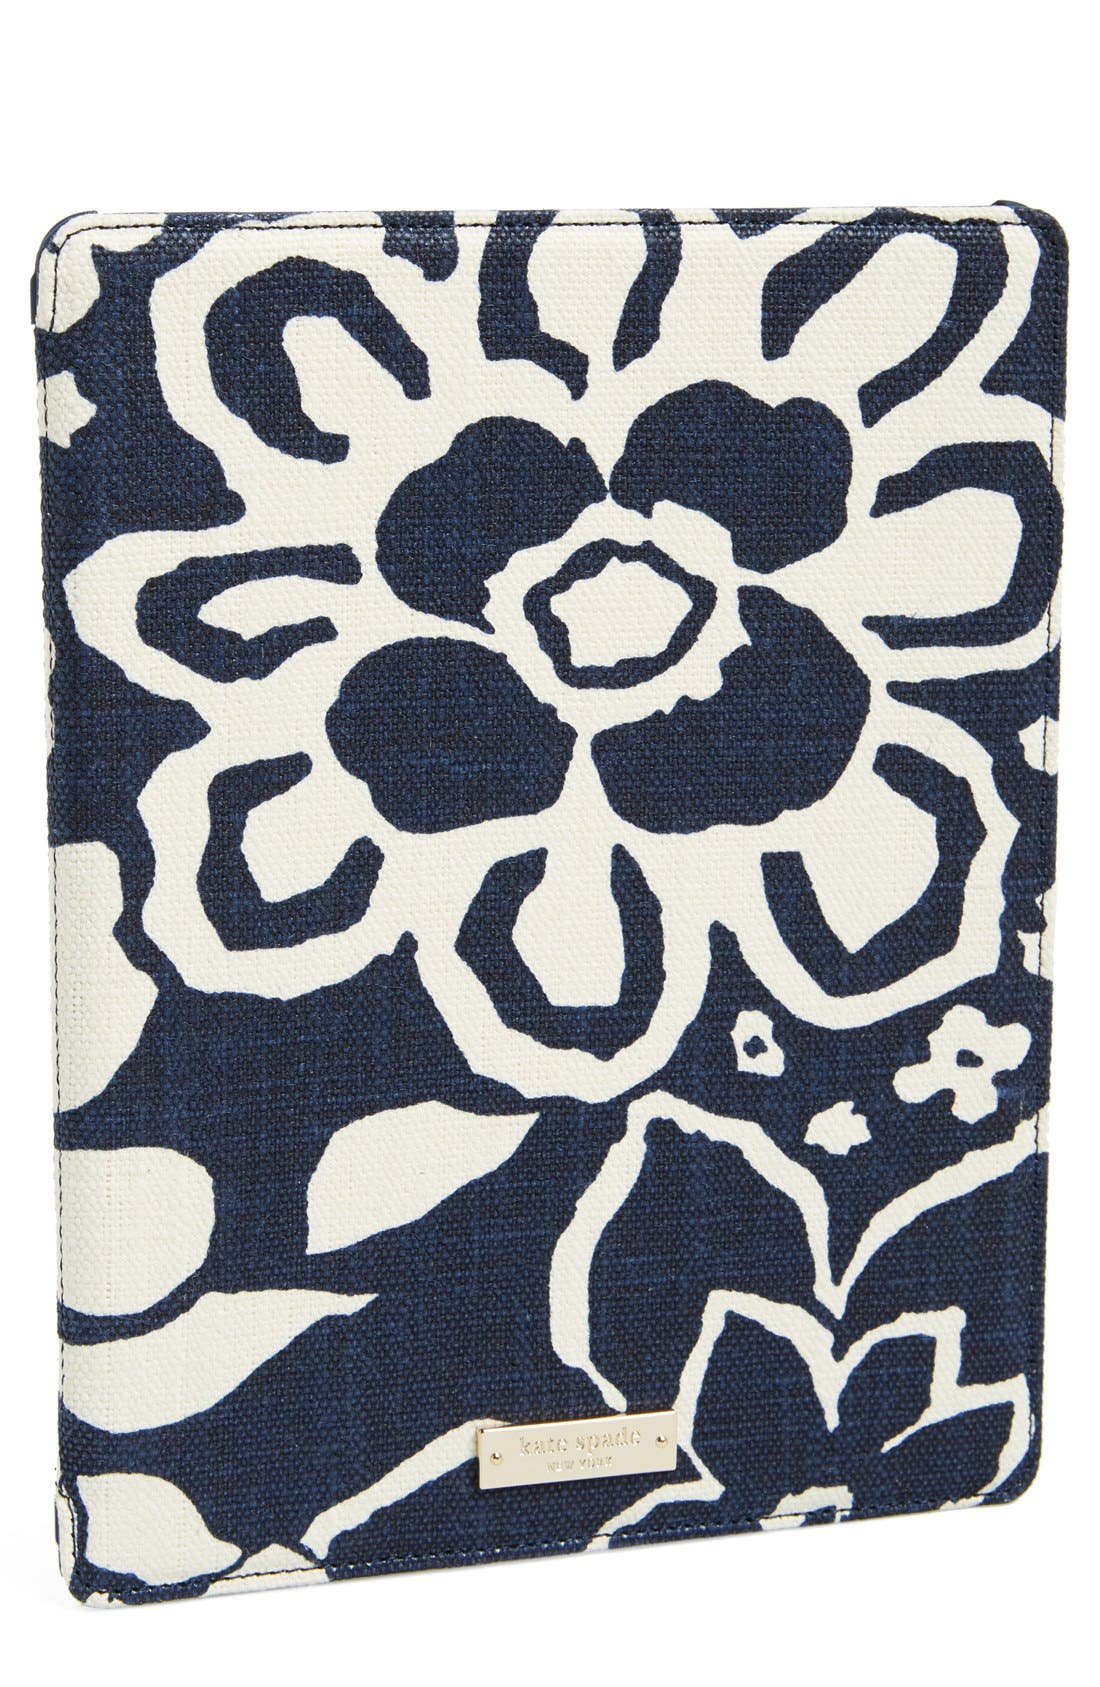 Alternate Image 1 Selected - kate spade new york 'monaco floral' iPad 2 & 3 folio